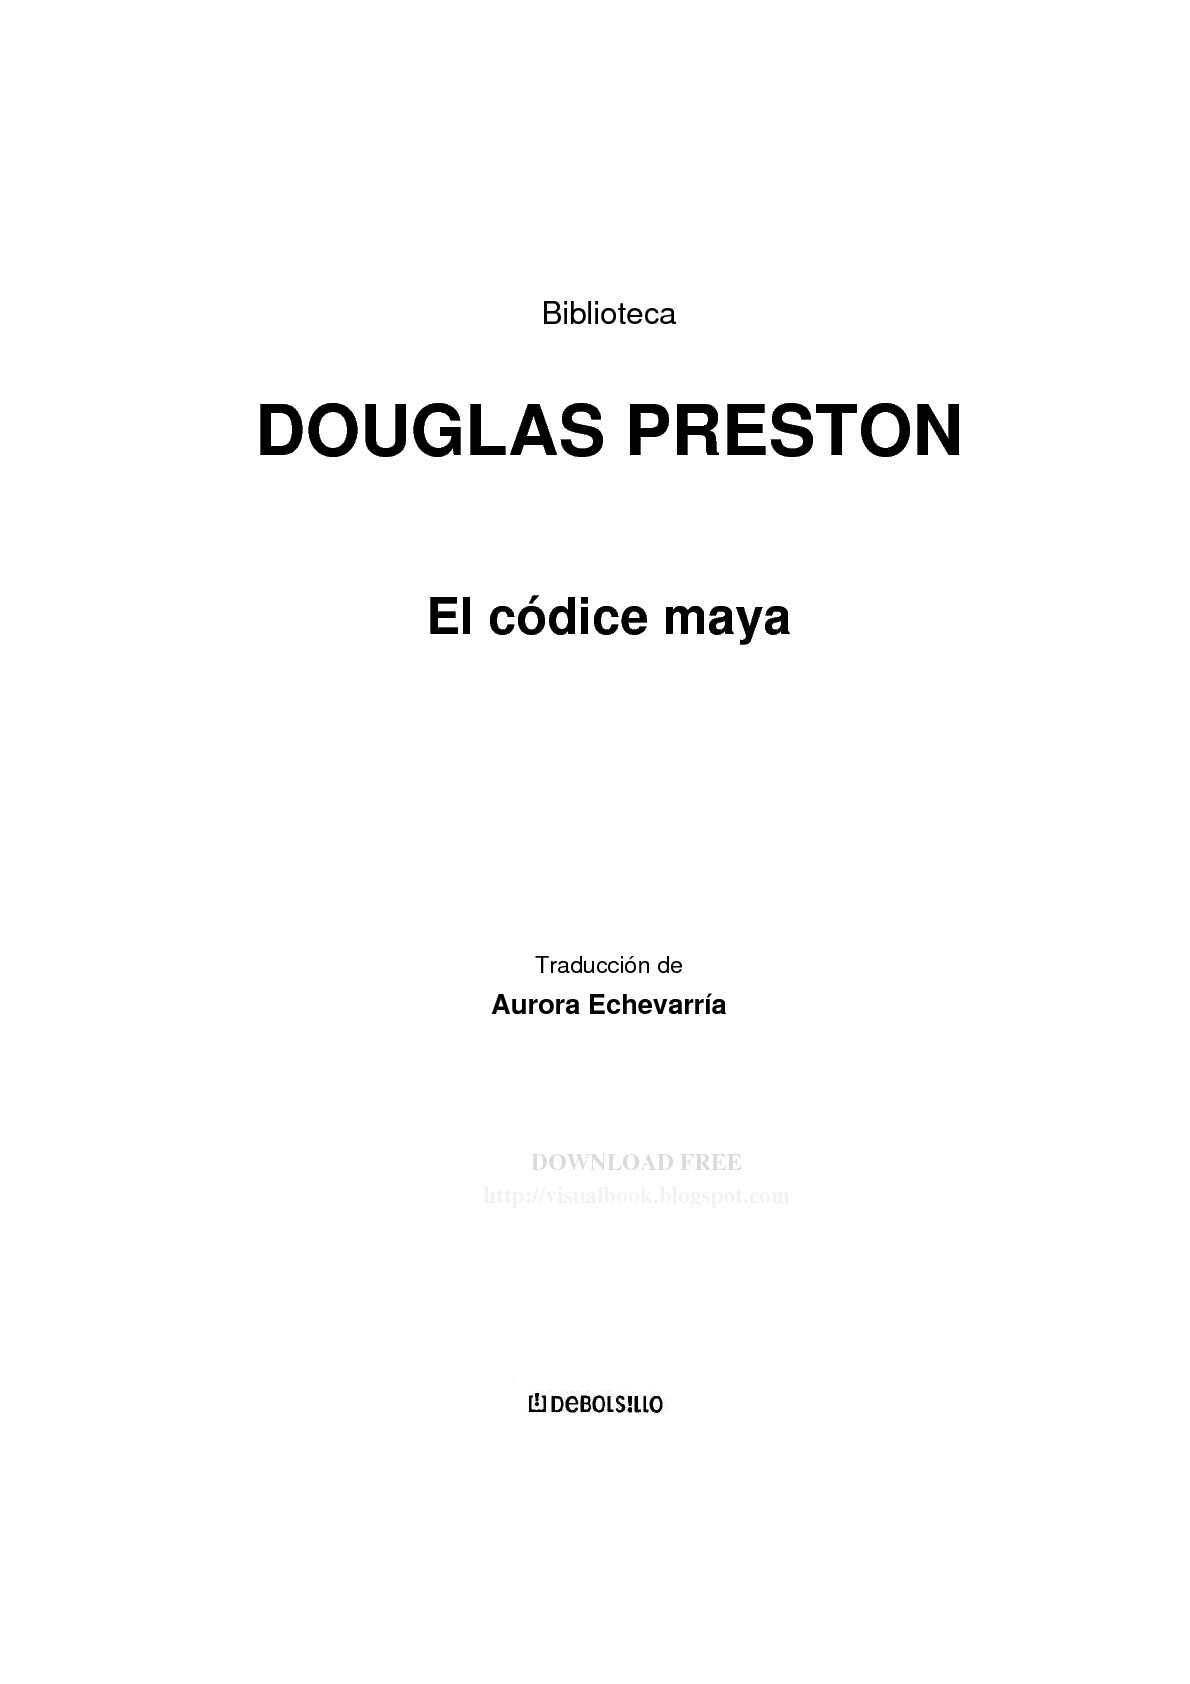 223a1e1e11 Calaméo - Douglas Preston - El códice maya